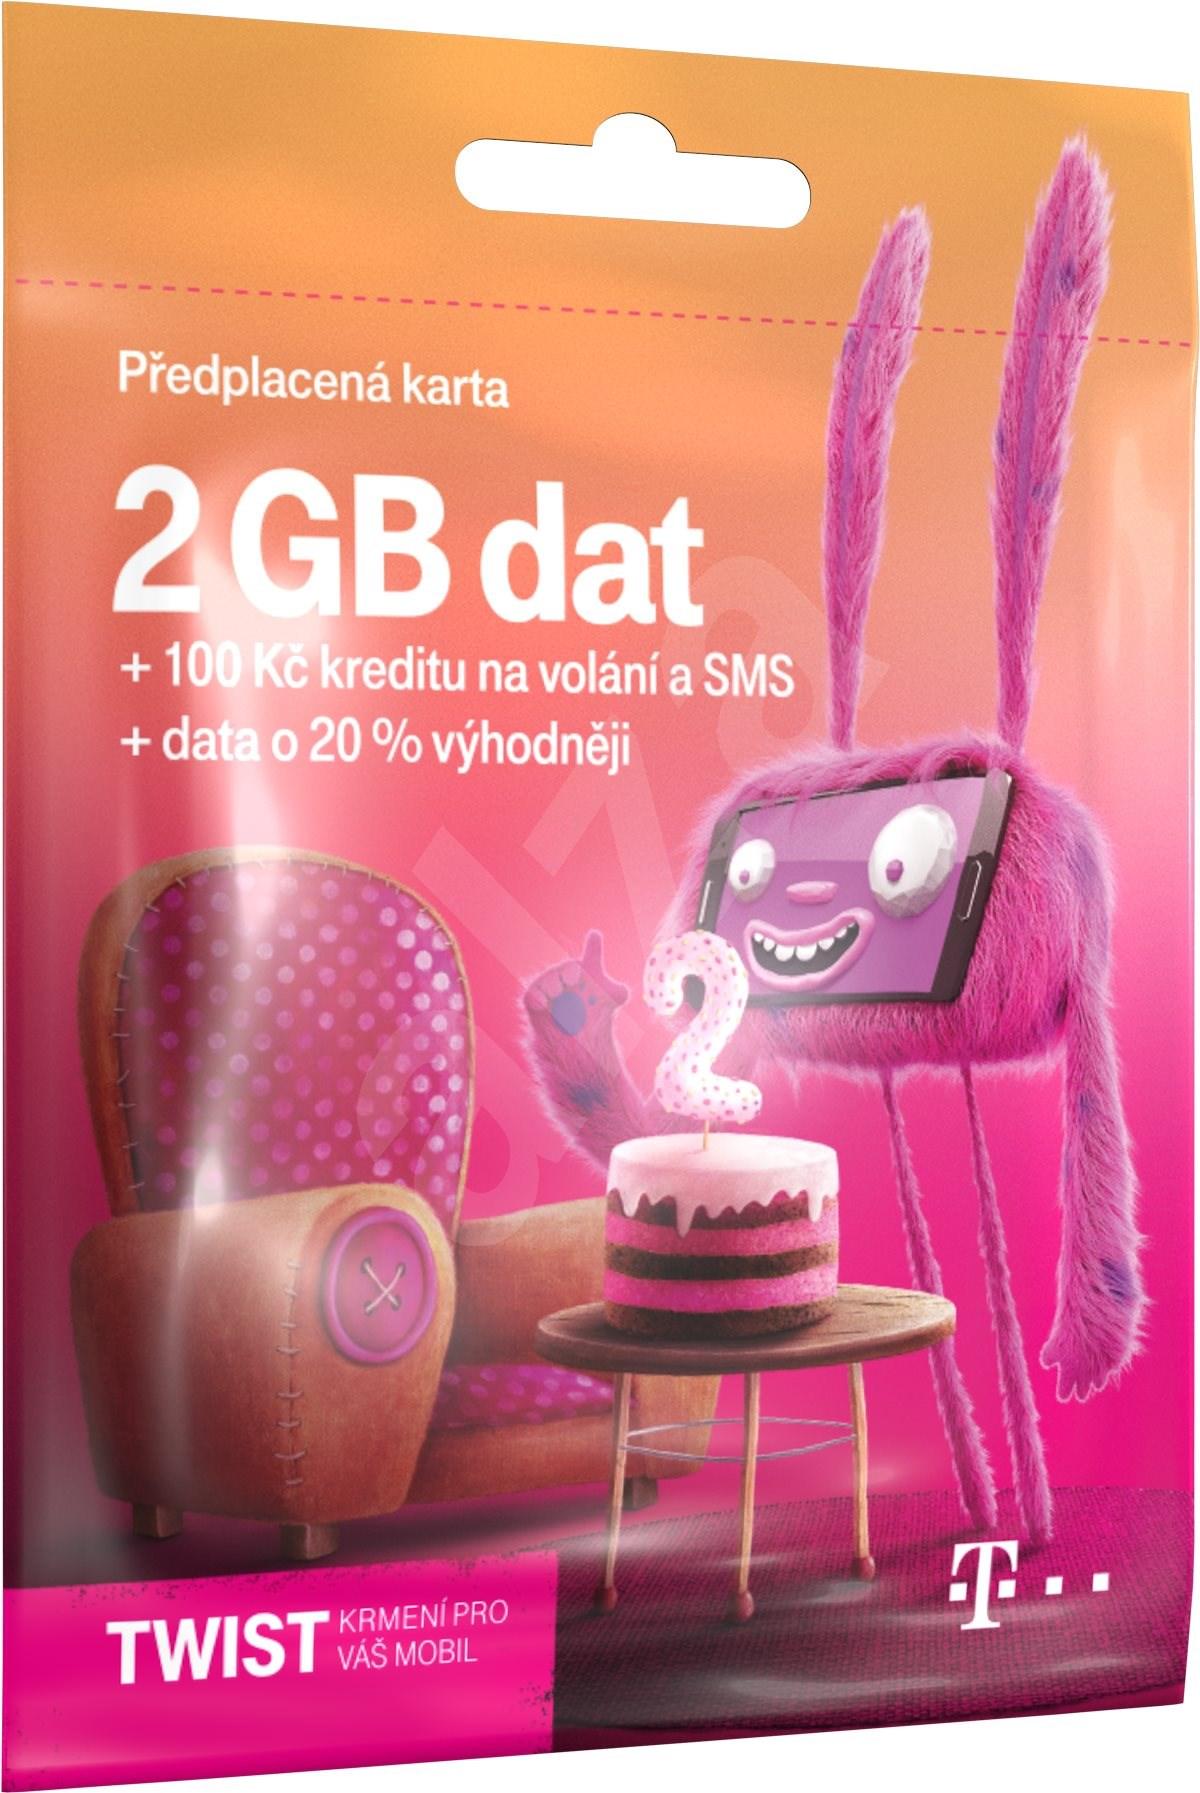 PŘEDPLACENÁ T-MOBILE TWIST SIM KARTA - 2GB - kredit 100 Kč